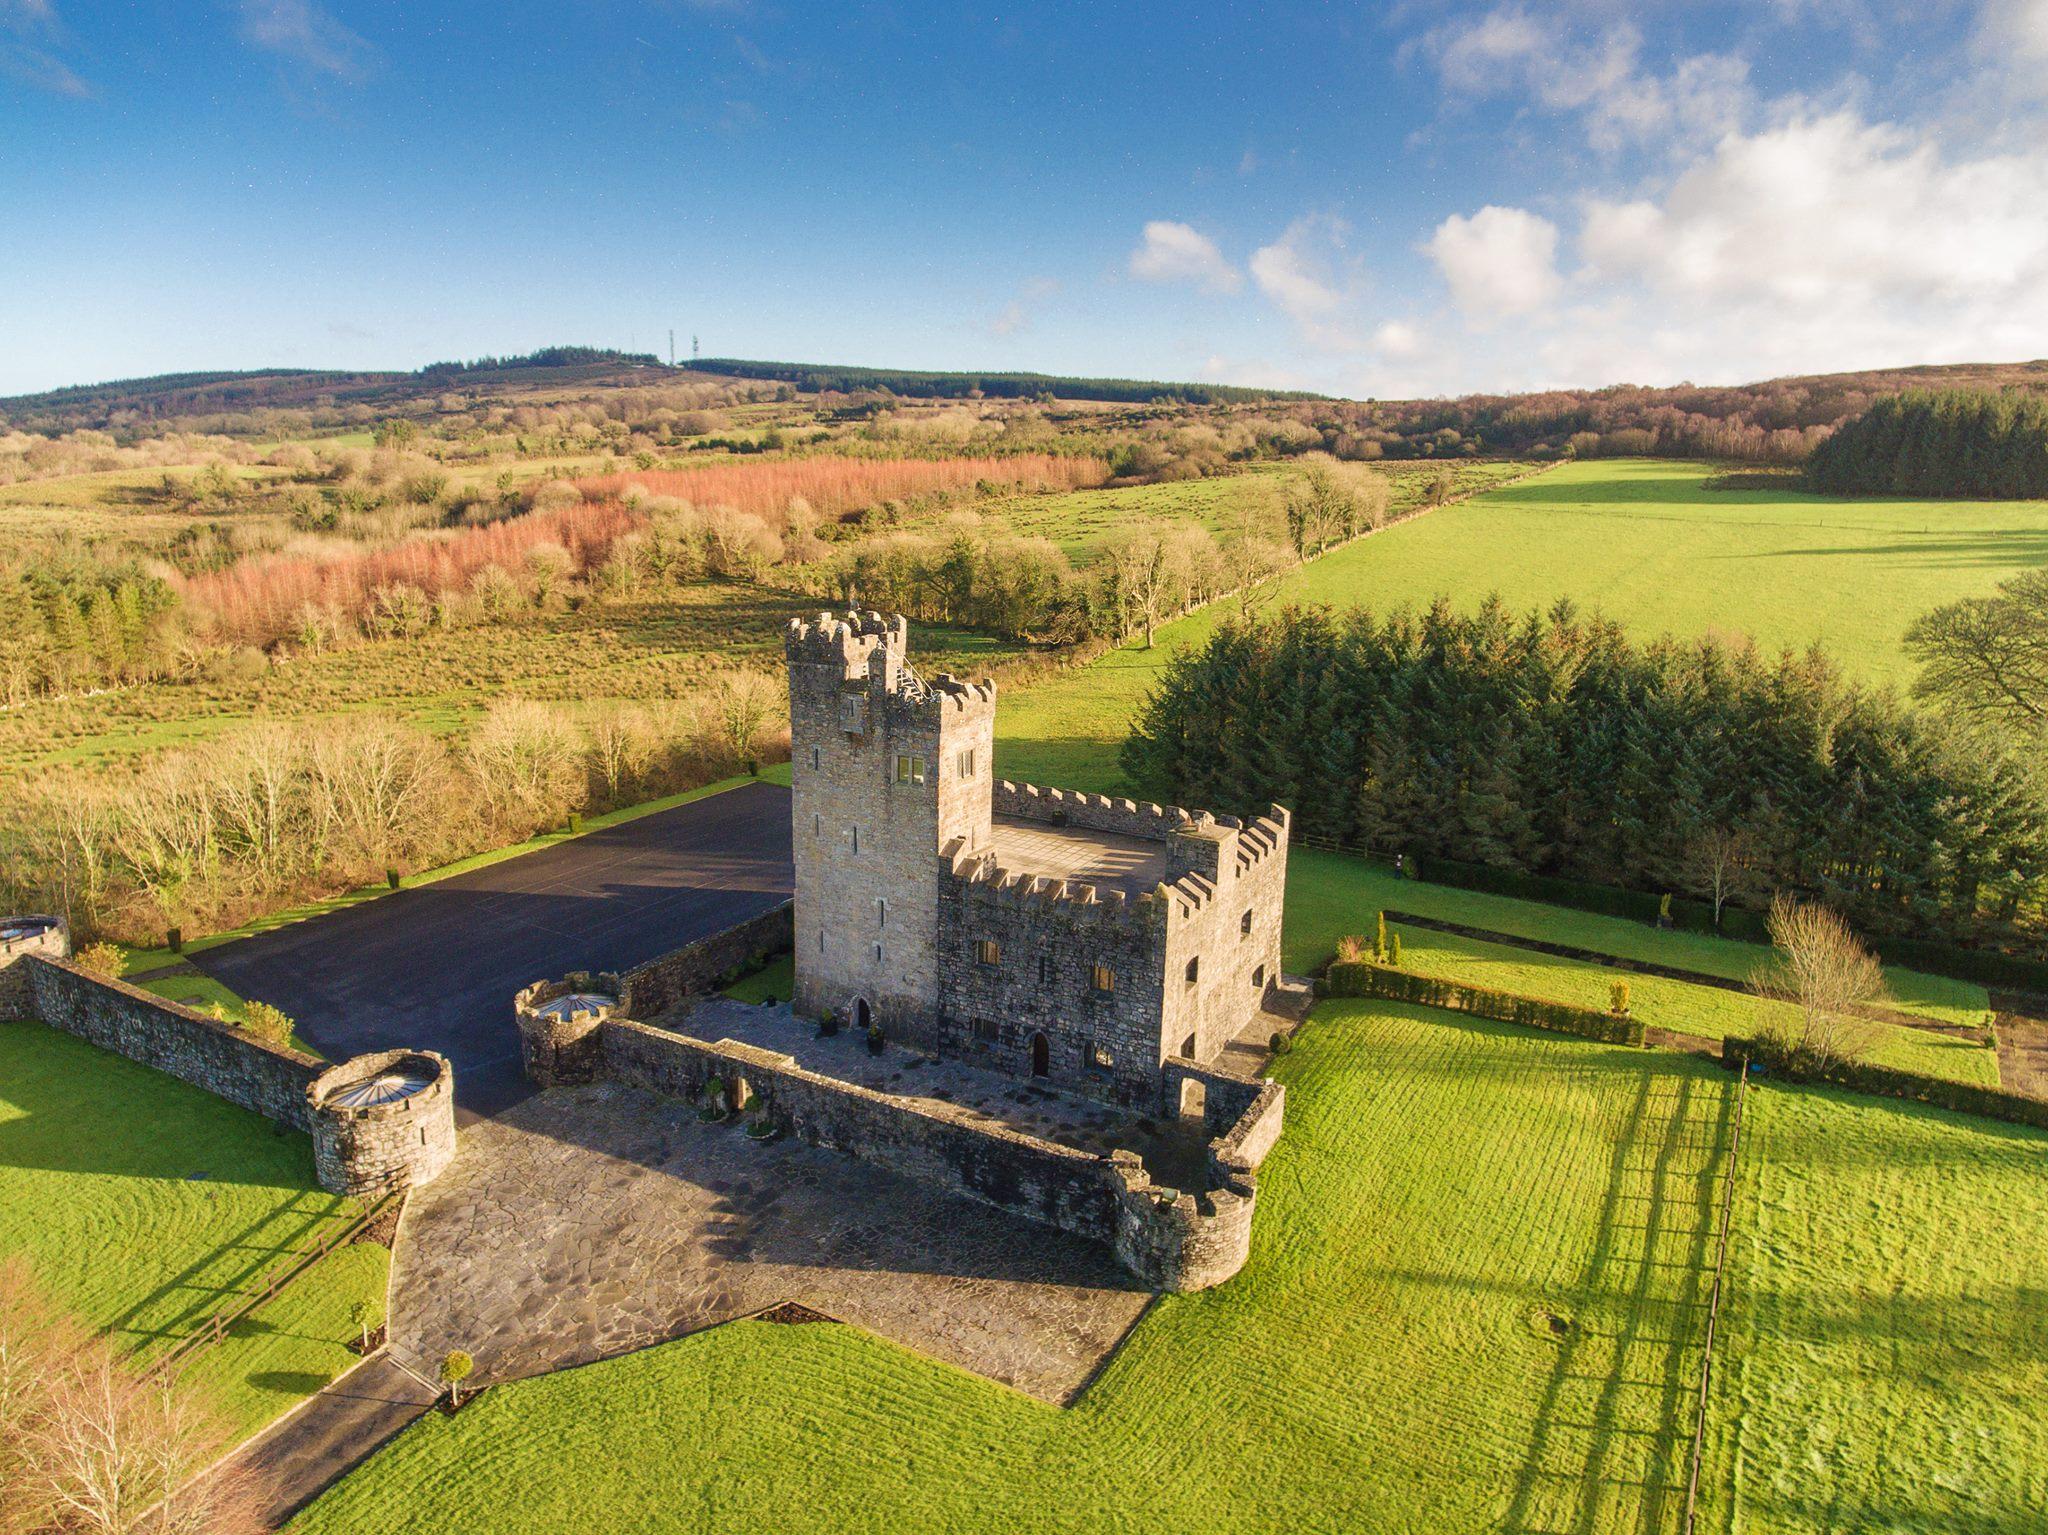 Cloghan Castle Aerial Photo - Visit Galway